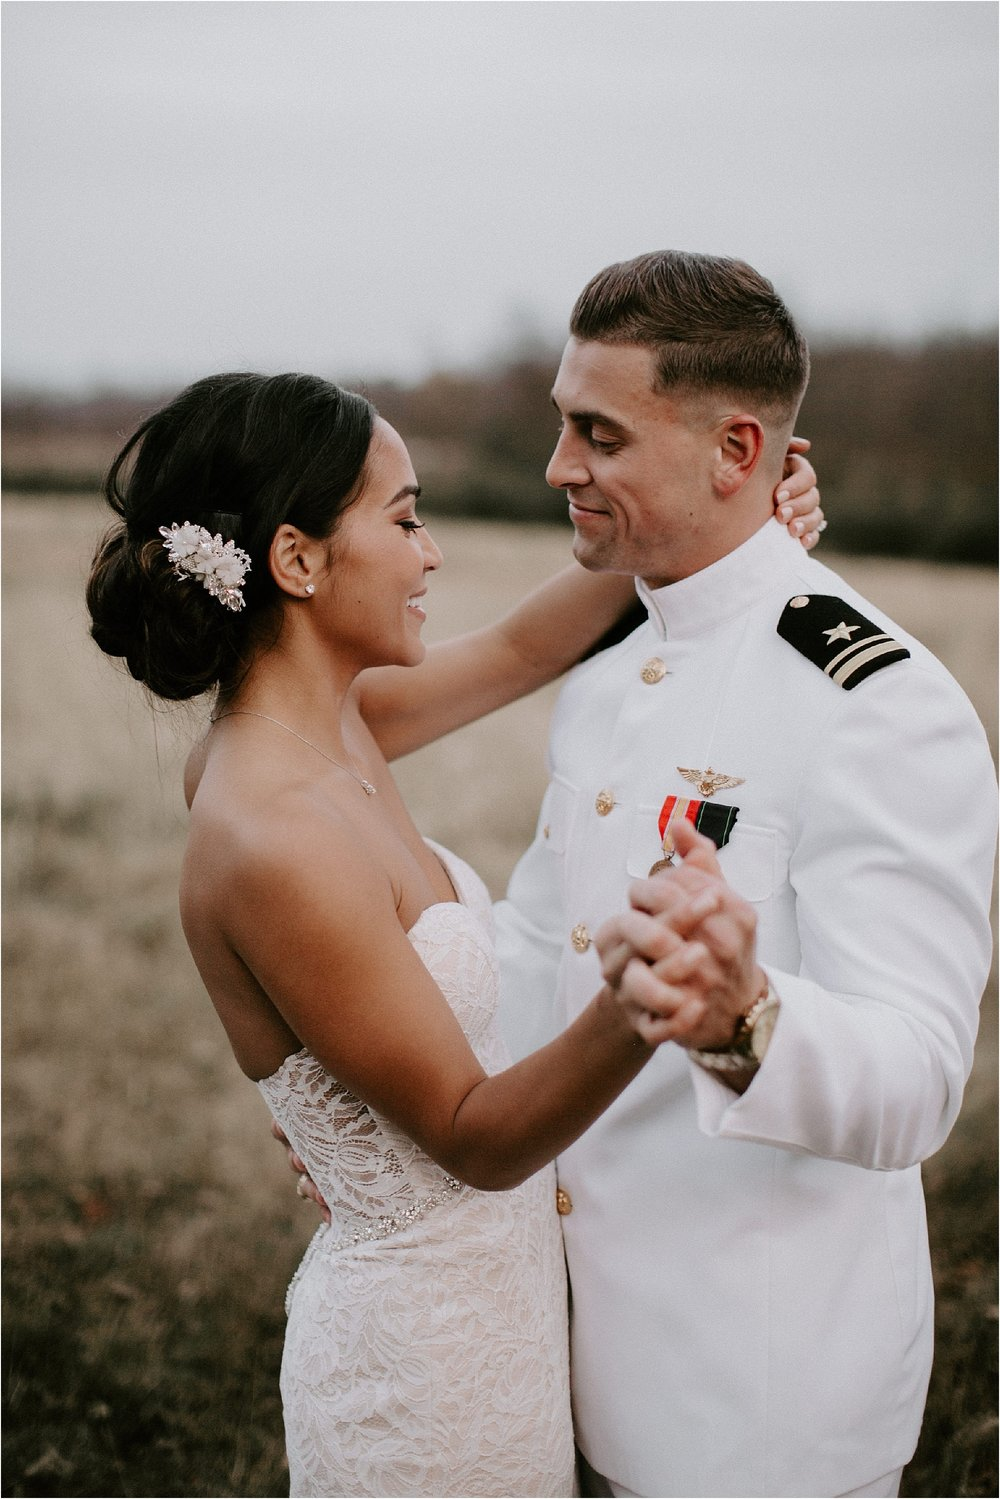 Sarah_Brookhart_Harrisburg_Wedding_Photographer_0040.jpg